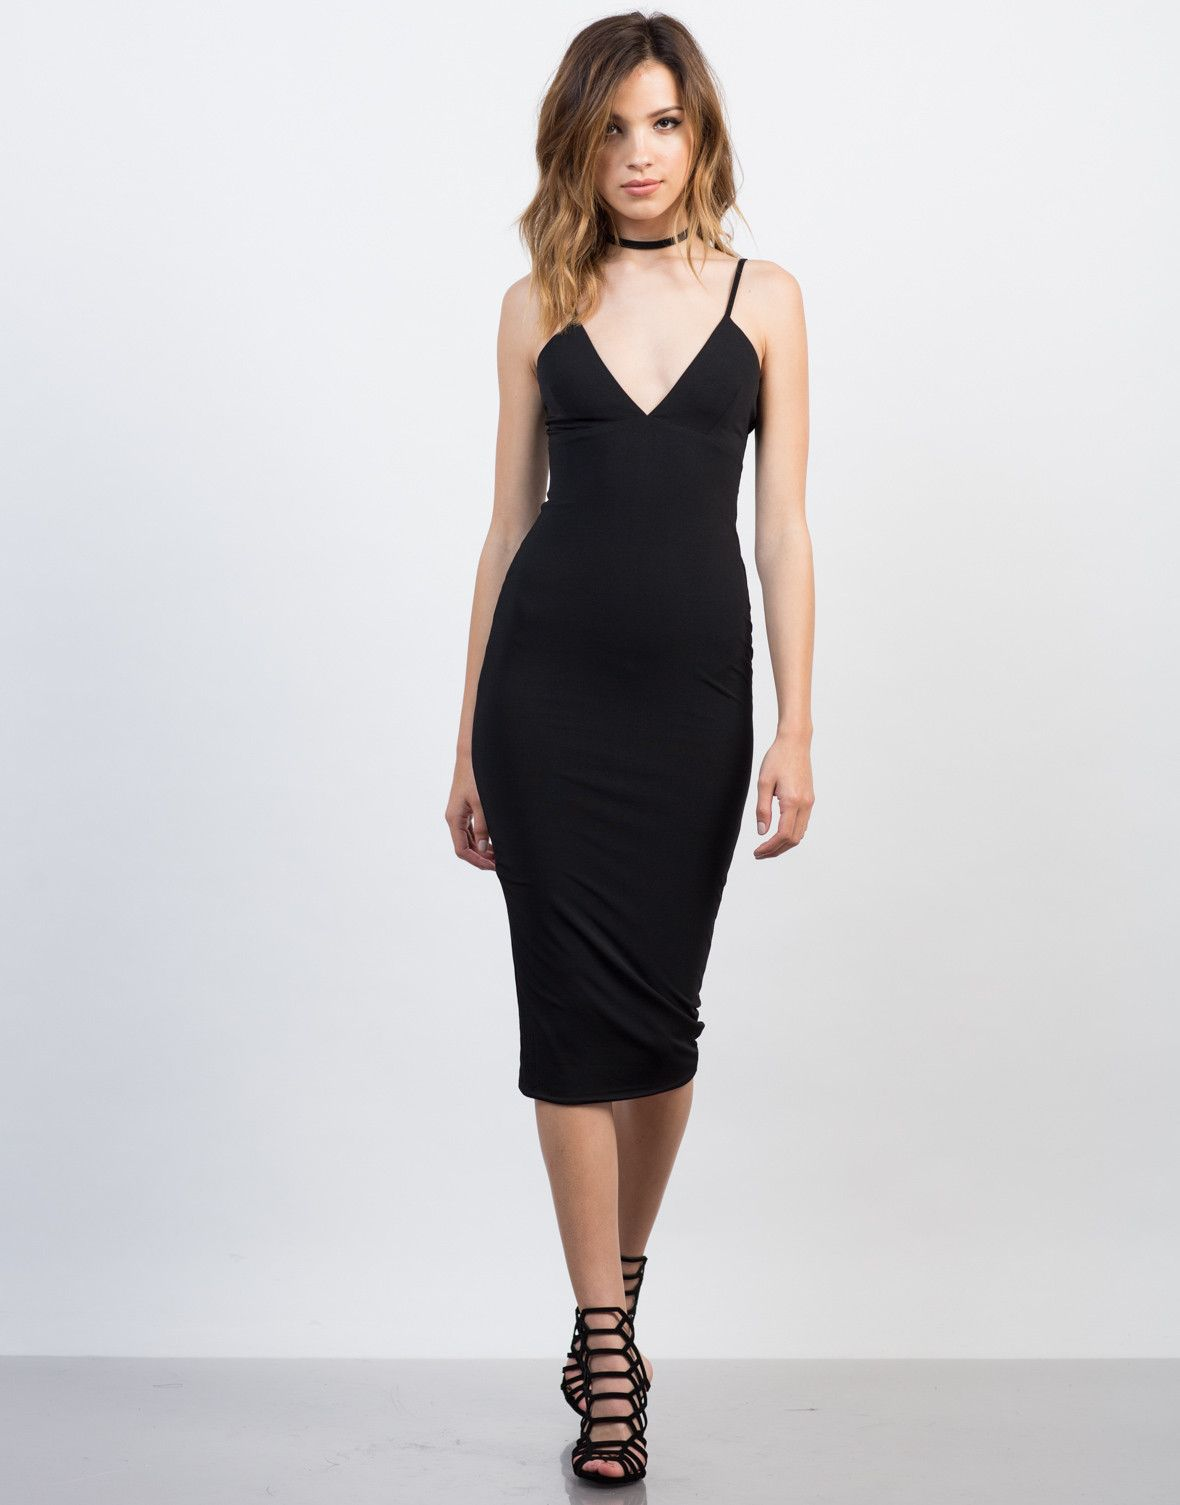 Midi Black Party Dress Black Party Dresses Dresses Party Dress [ 1505 x 1180 Pixel ]